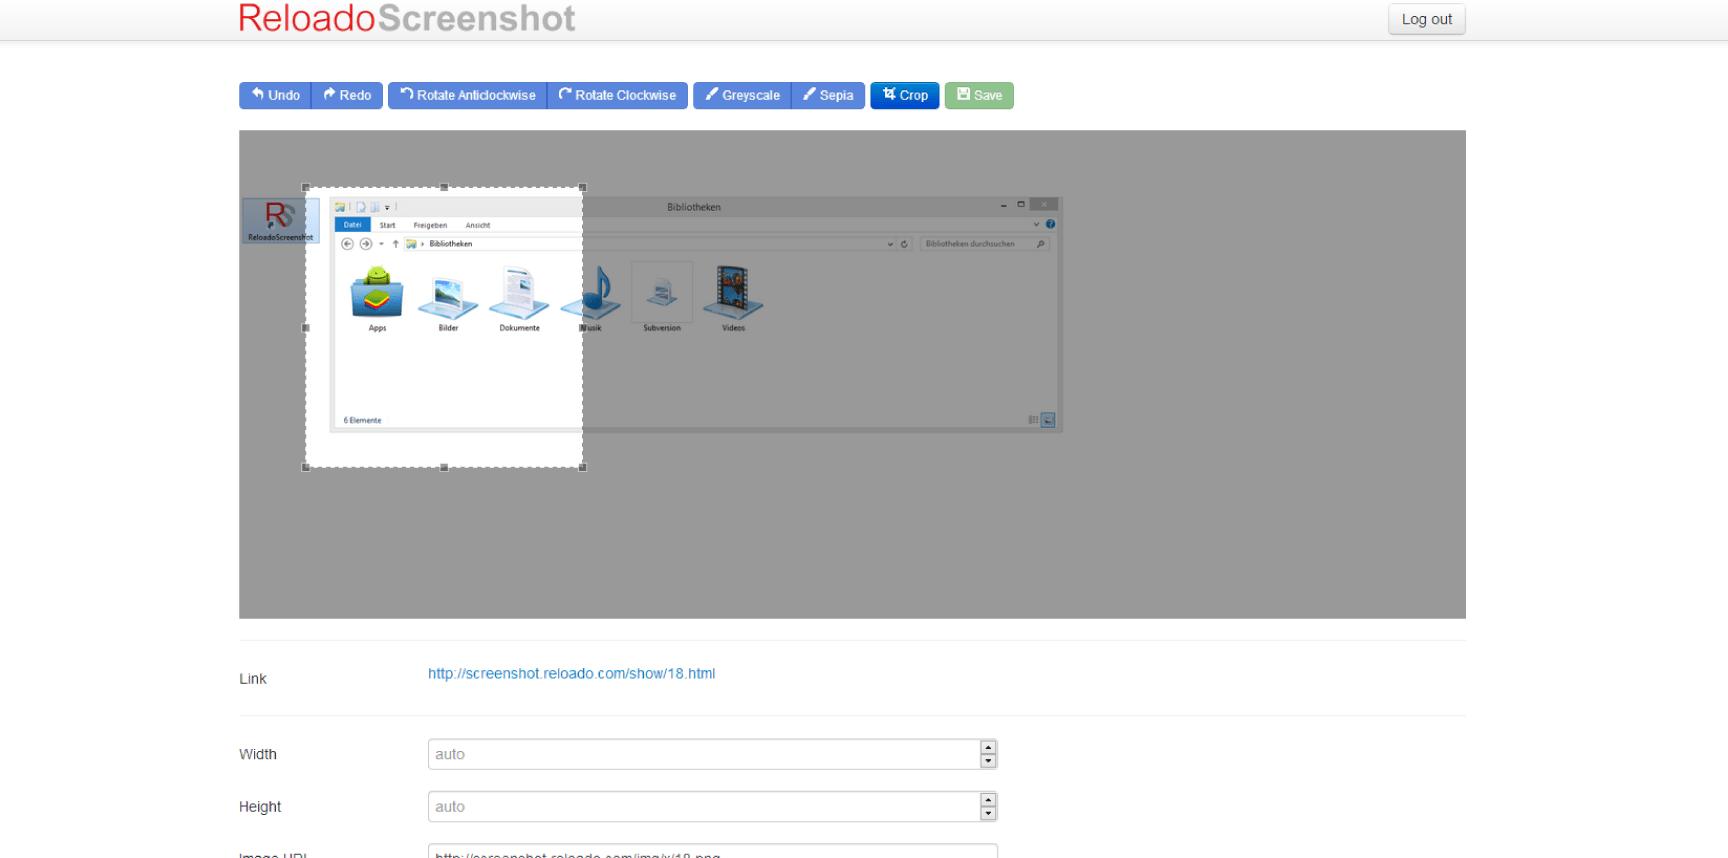 reloadoscreenshot_1_335774.png